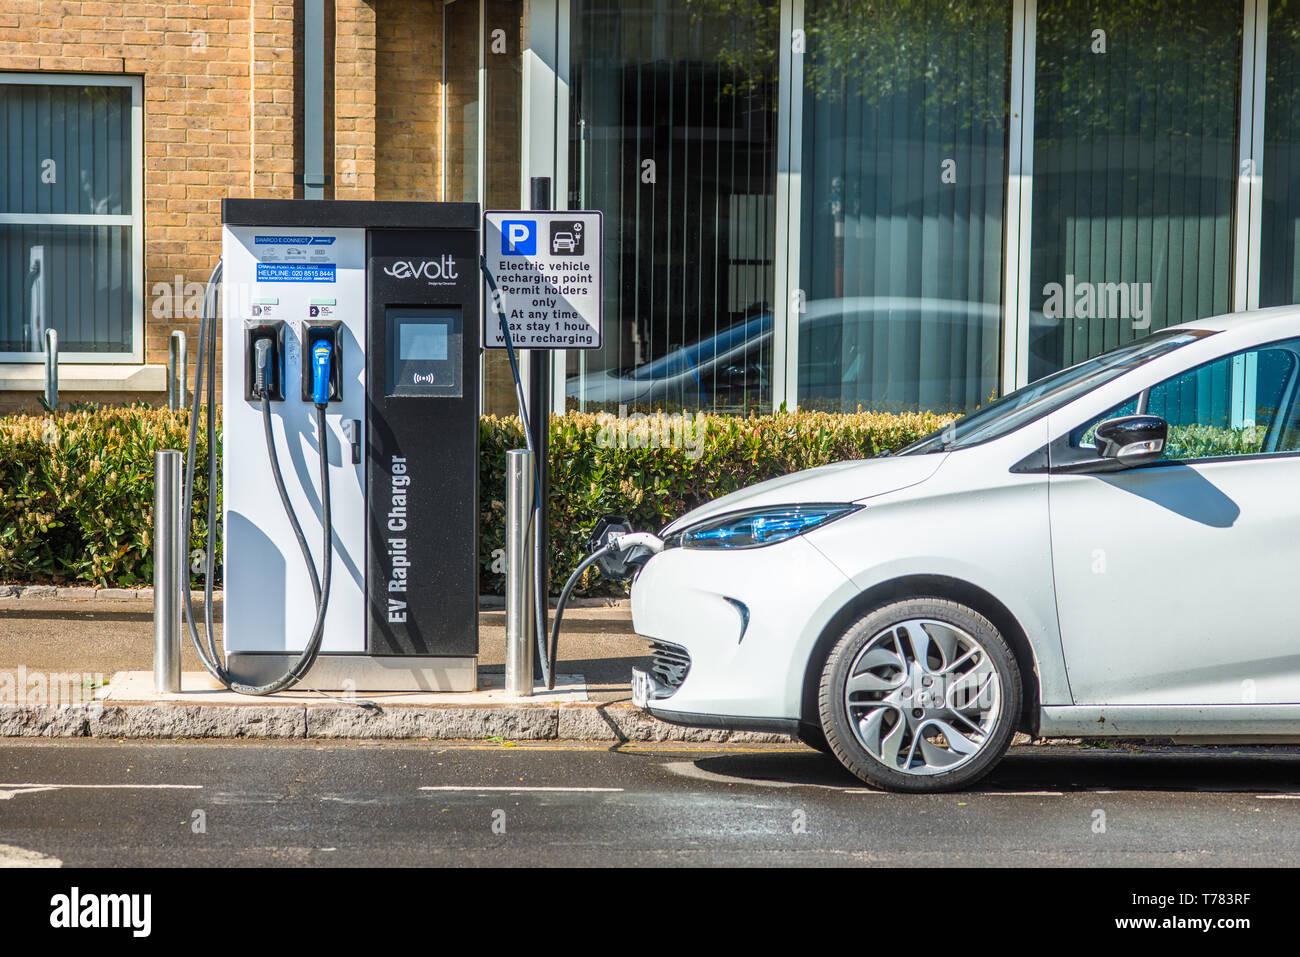 Elektroauto gesteckt Evolt Point in Cambridge, England, UK. Stockfoto